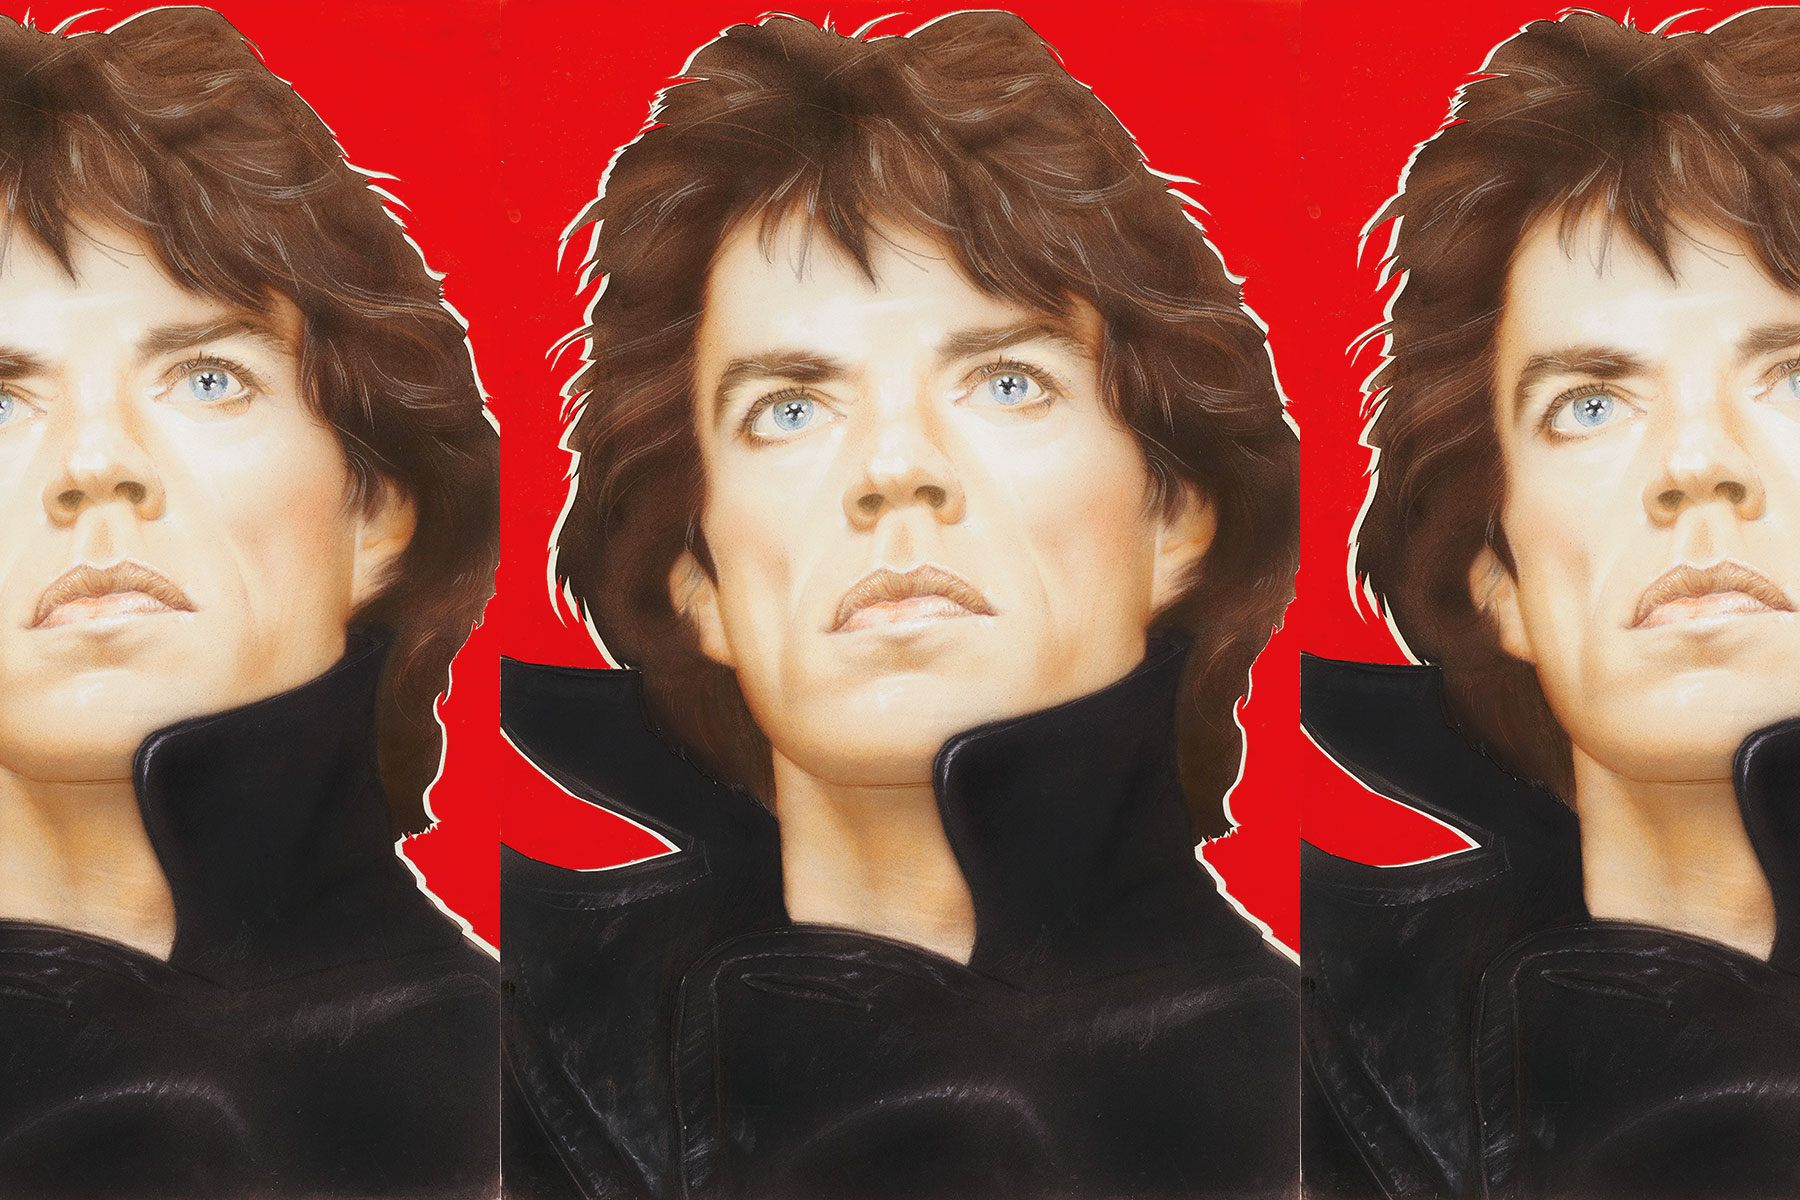 Mick Jagger by Richard Bernstein. Starmaker by Roger Padhila & Mauricio Padhila. Rizzoli Books. Ponyboy magazine.